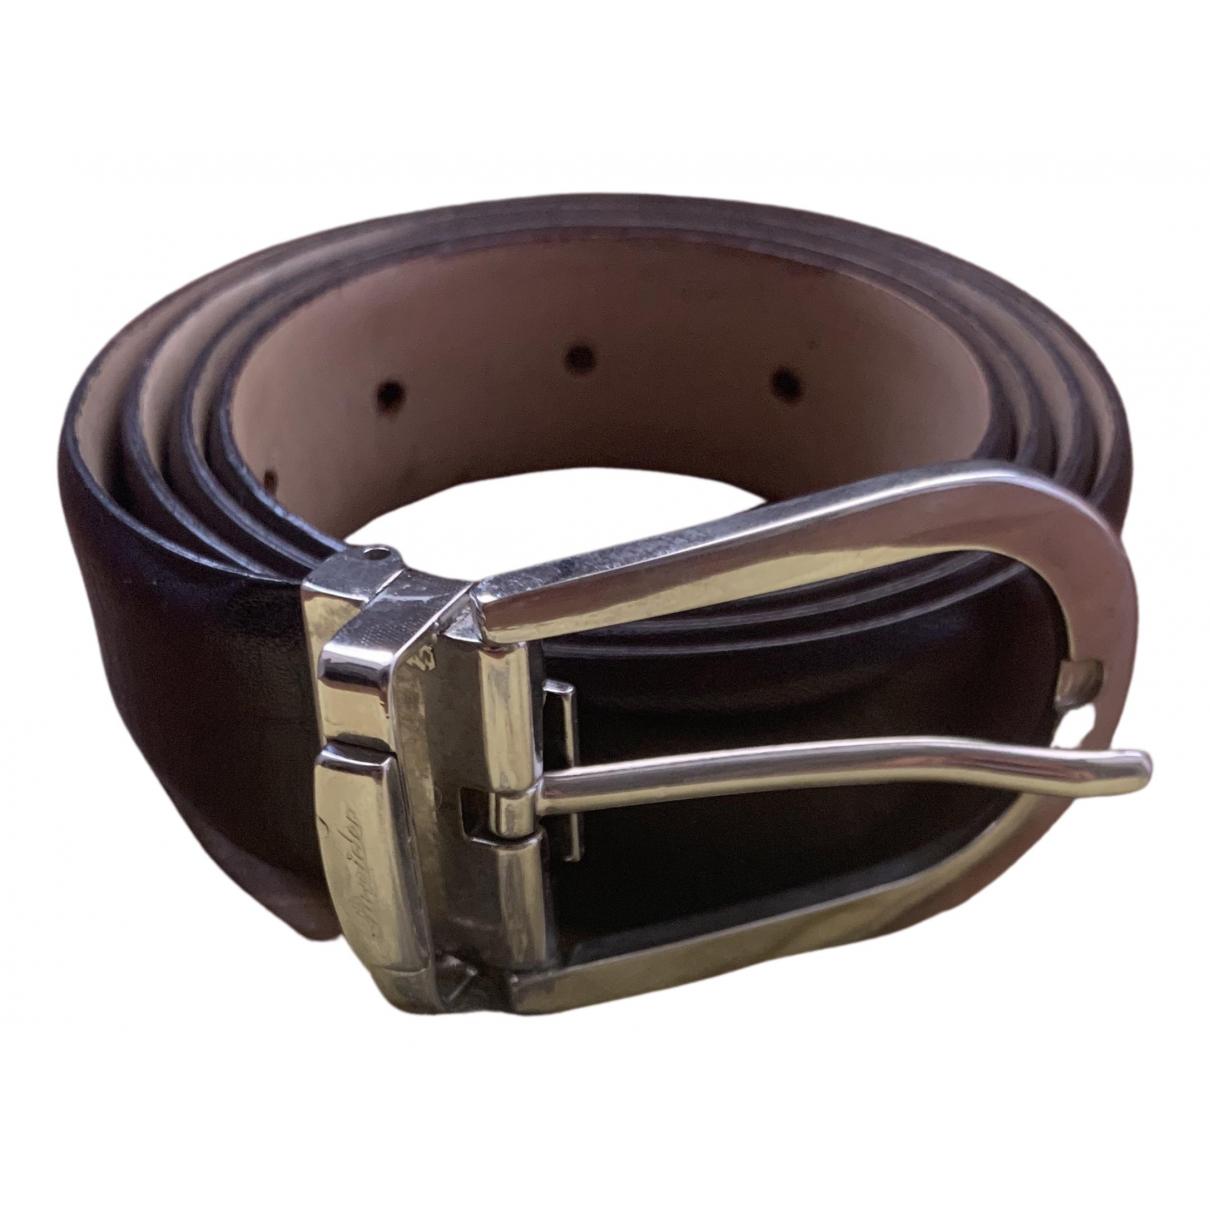 Pineider \N Brown Leather belt for Men 90 cm